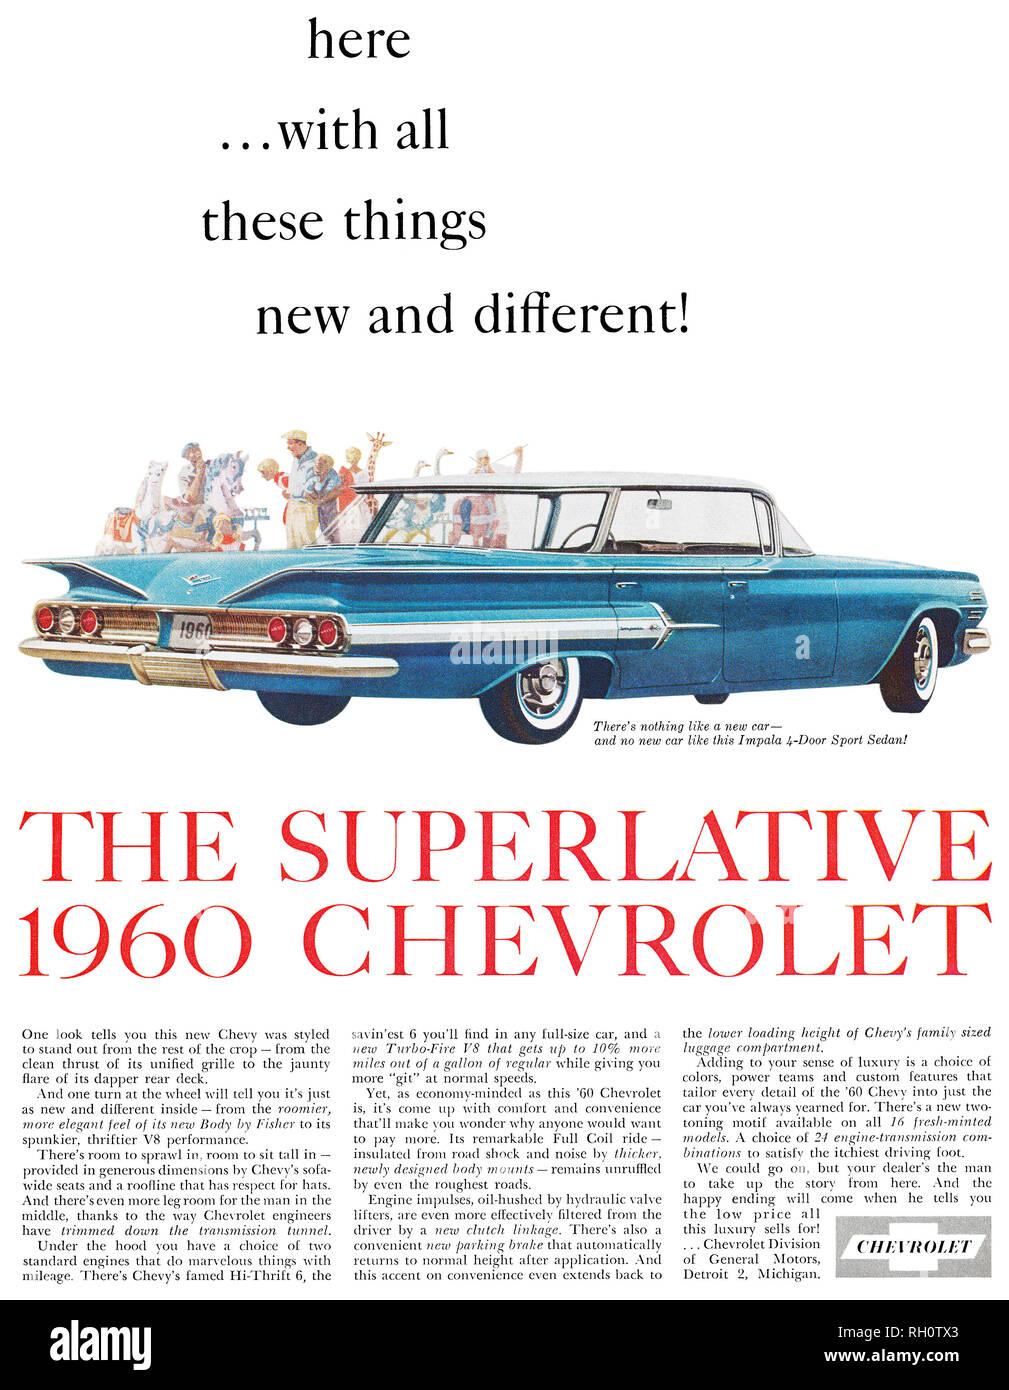 1959 U.S. advertisement for the 1960 Chevrolet, showing the Chevrolet Impala 4-door sport sedan. - Stock Image